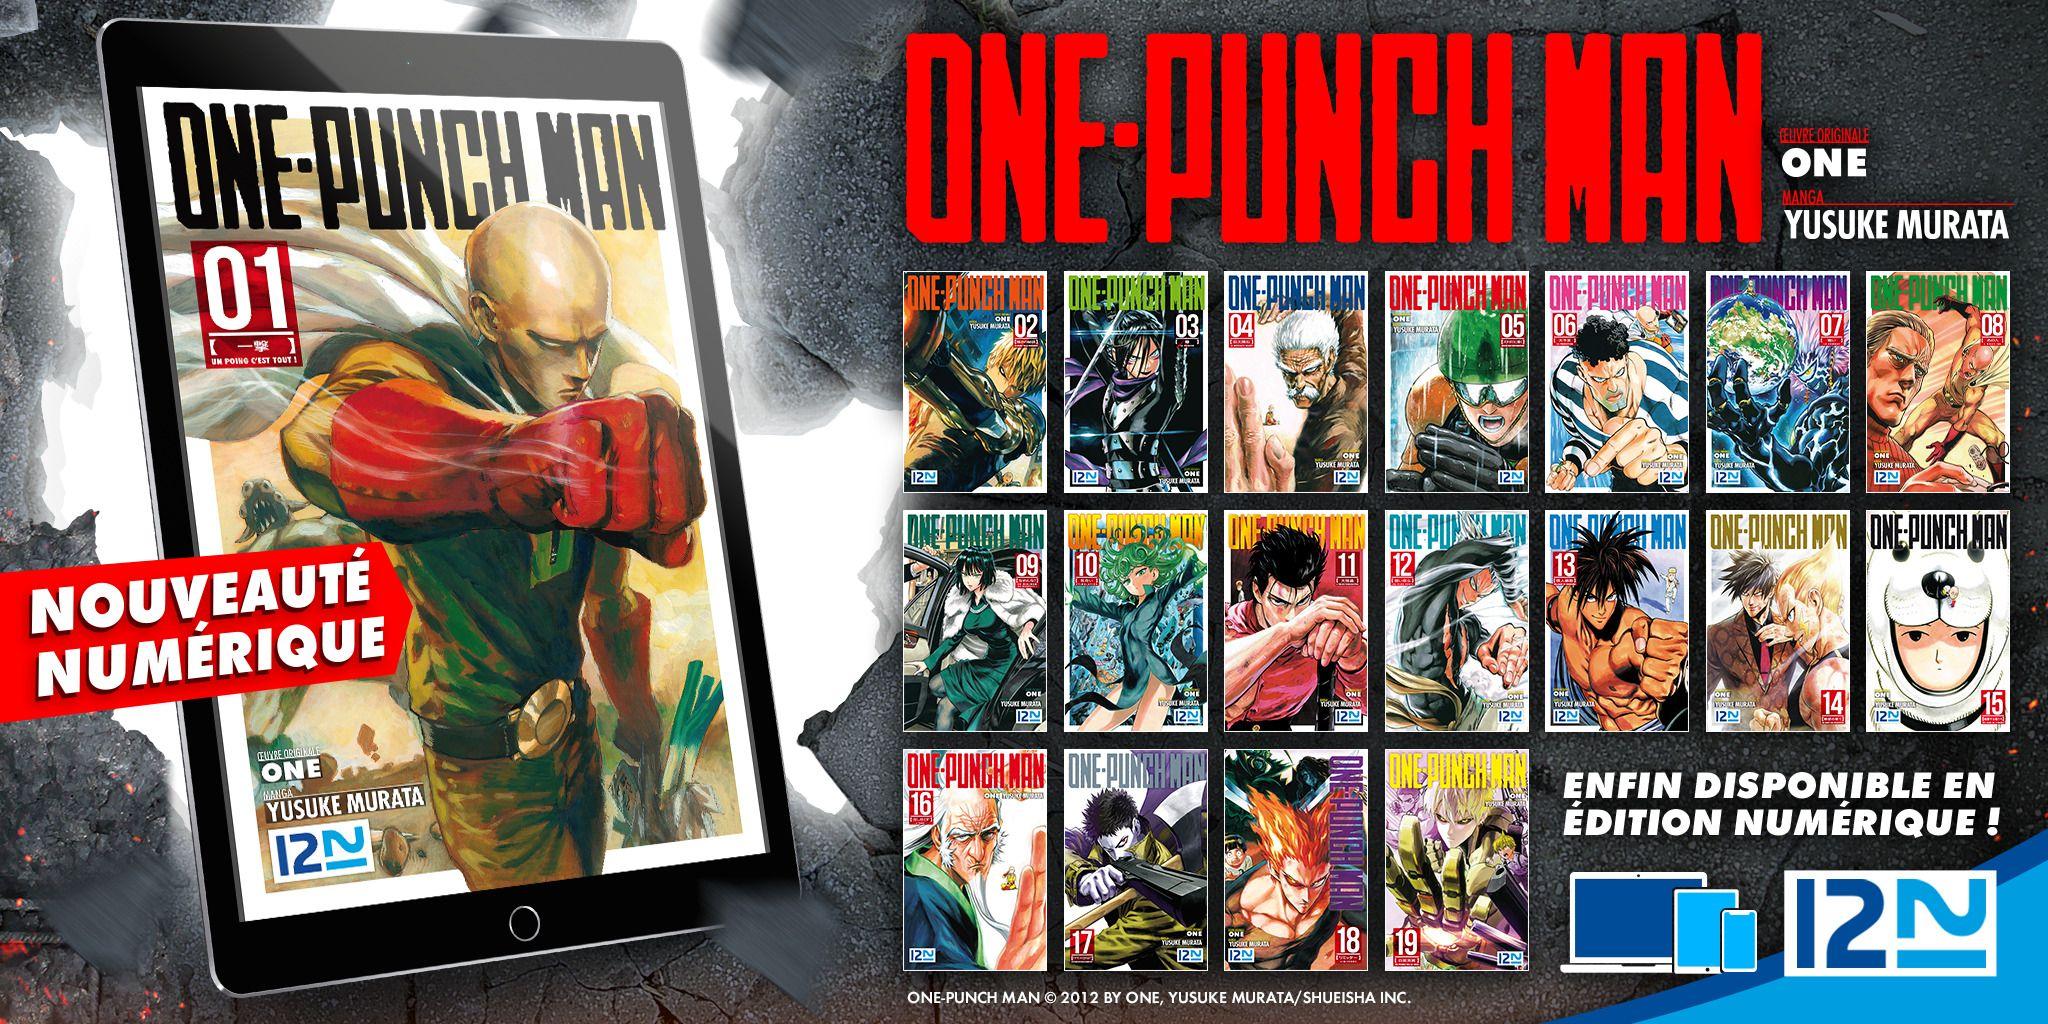 One-Punch-Man-numerique.jpg